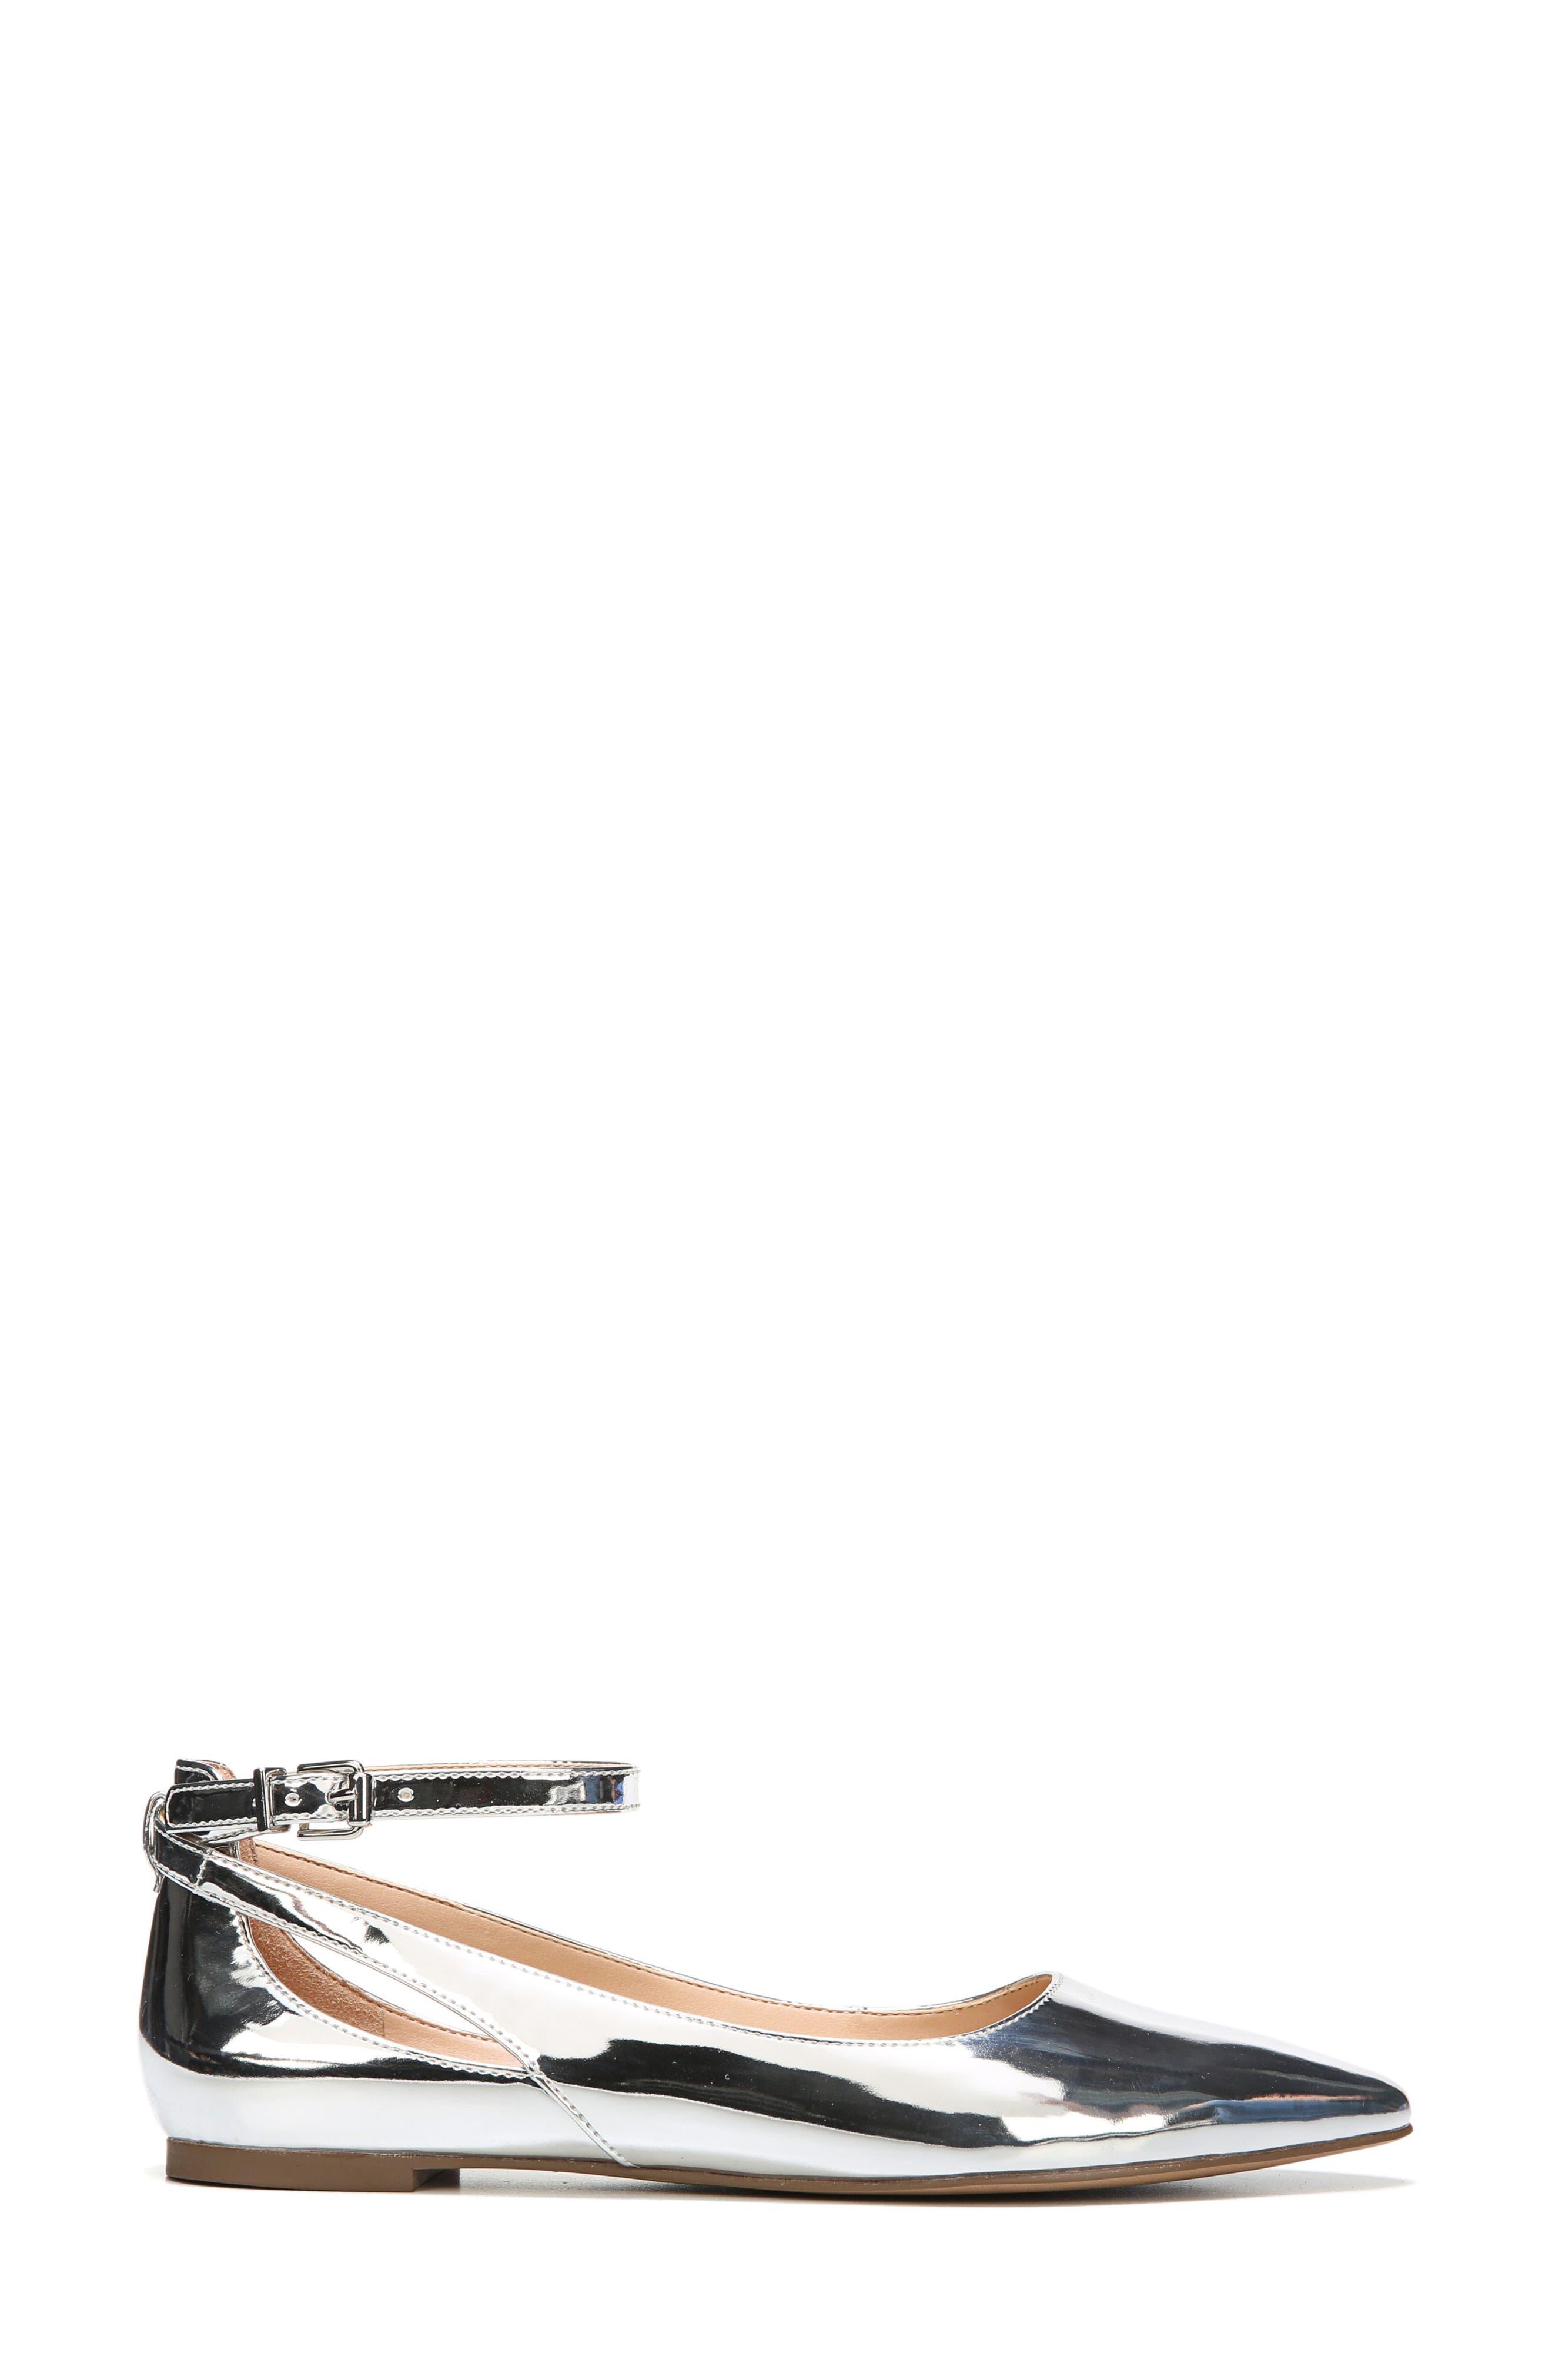 Alternate Image 3  - SARTO by Franco Sarto Sylvia Ankle Strap Flat (Women)